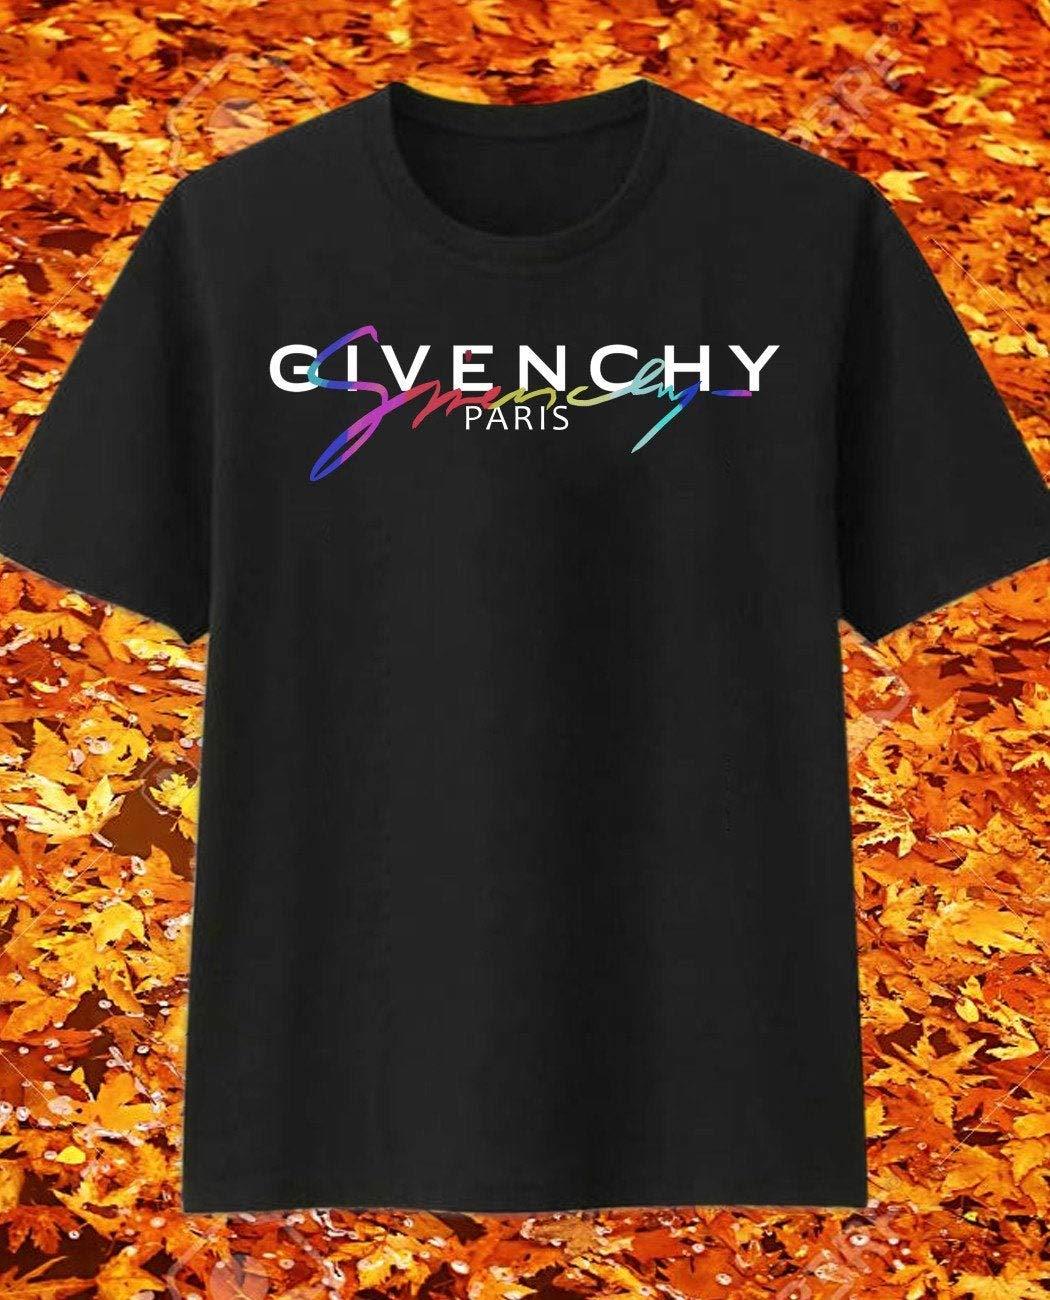 Givenchy, Givenchy Paris, Givenchy Paris, Givenchy, Givenchy, Fashion, Vintage Fashion, Vi